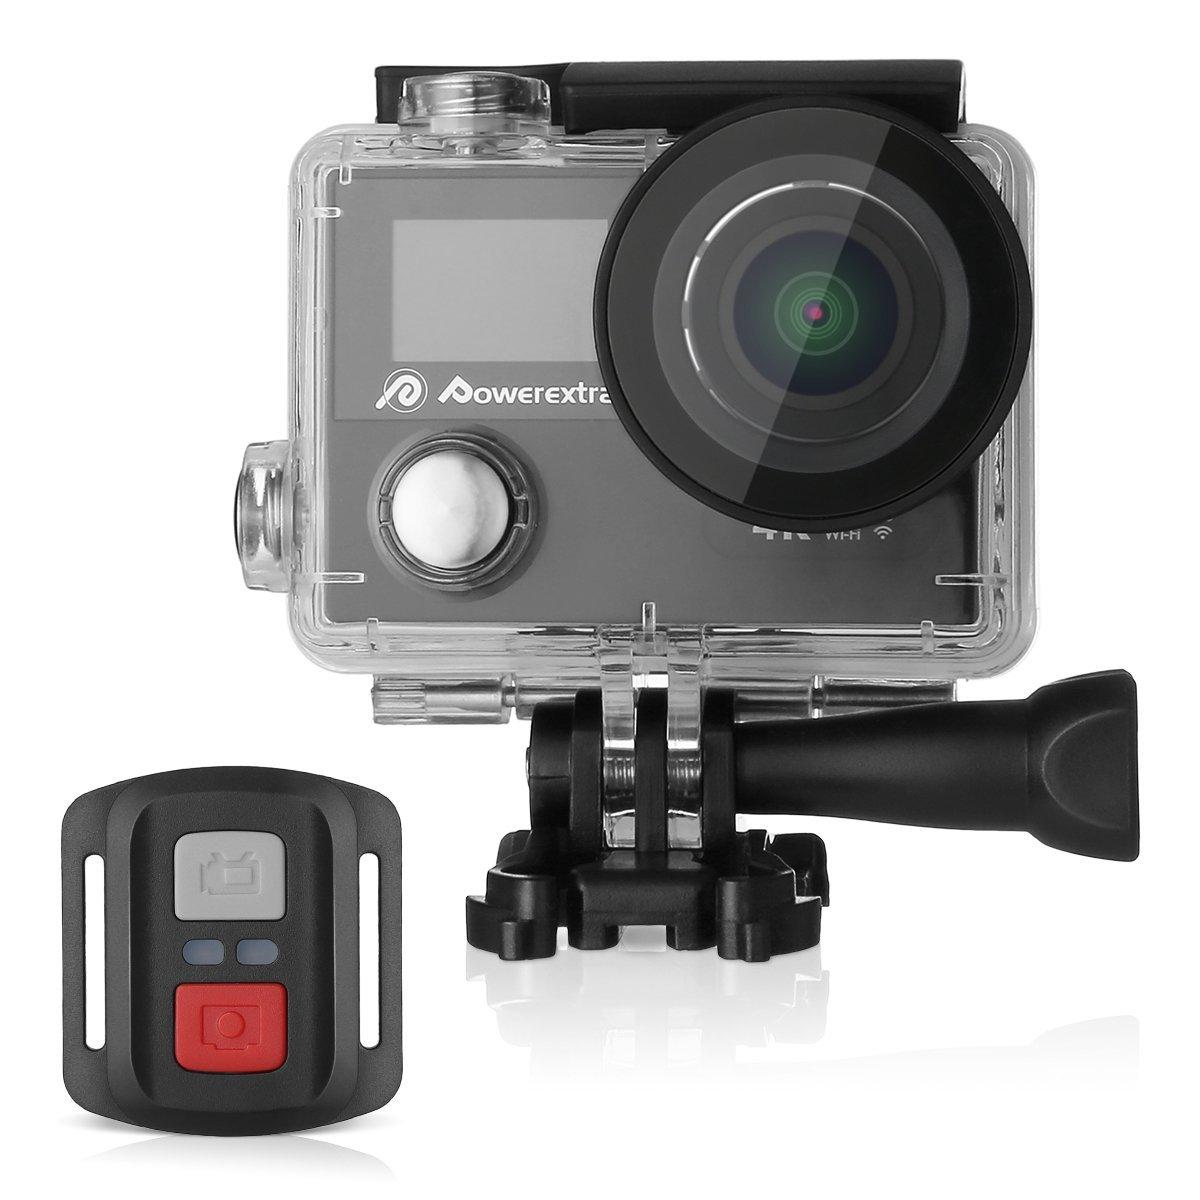 8d67271e1 Powerextra 4K Waterproof Sport Action Camera Ultra HD Camcorder ...